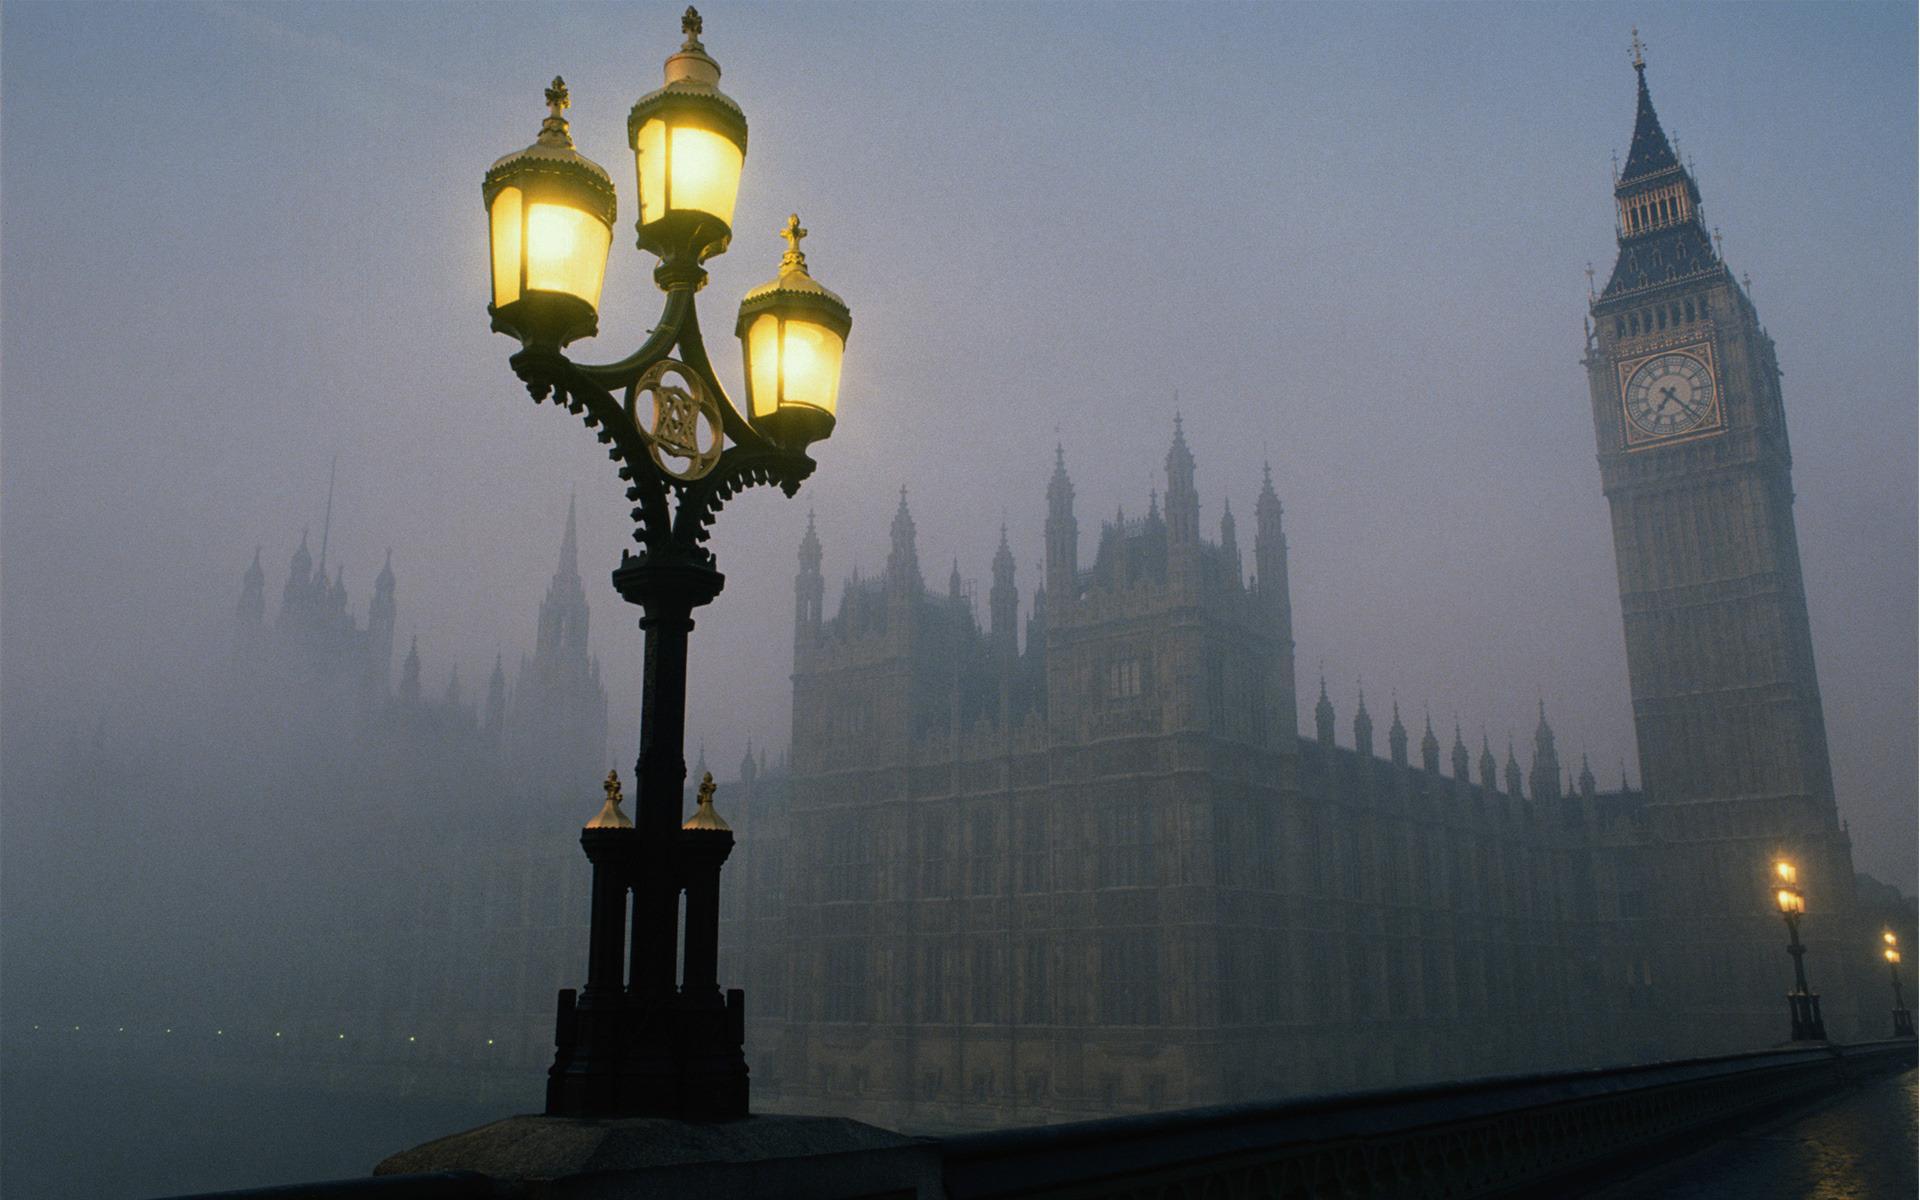 Обои лондон утро биг бен часы 1920x1200